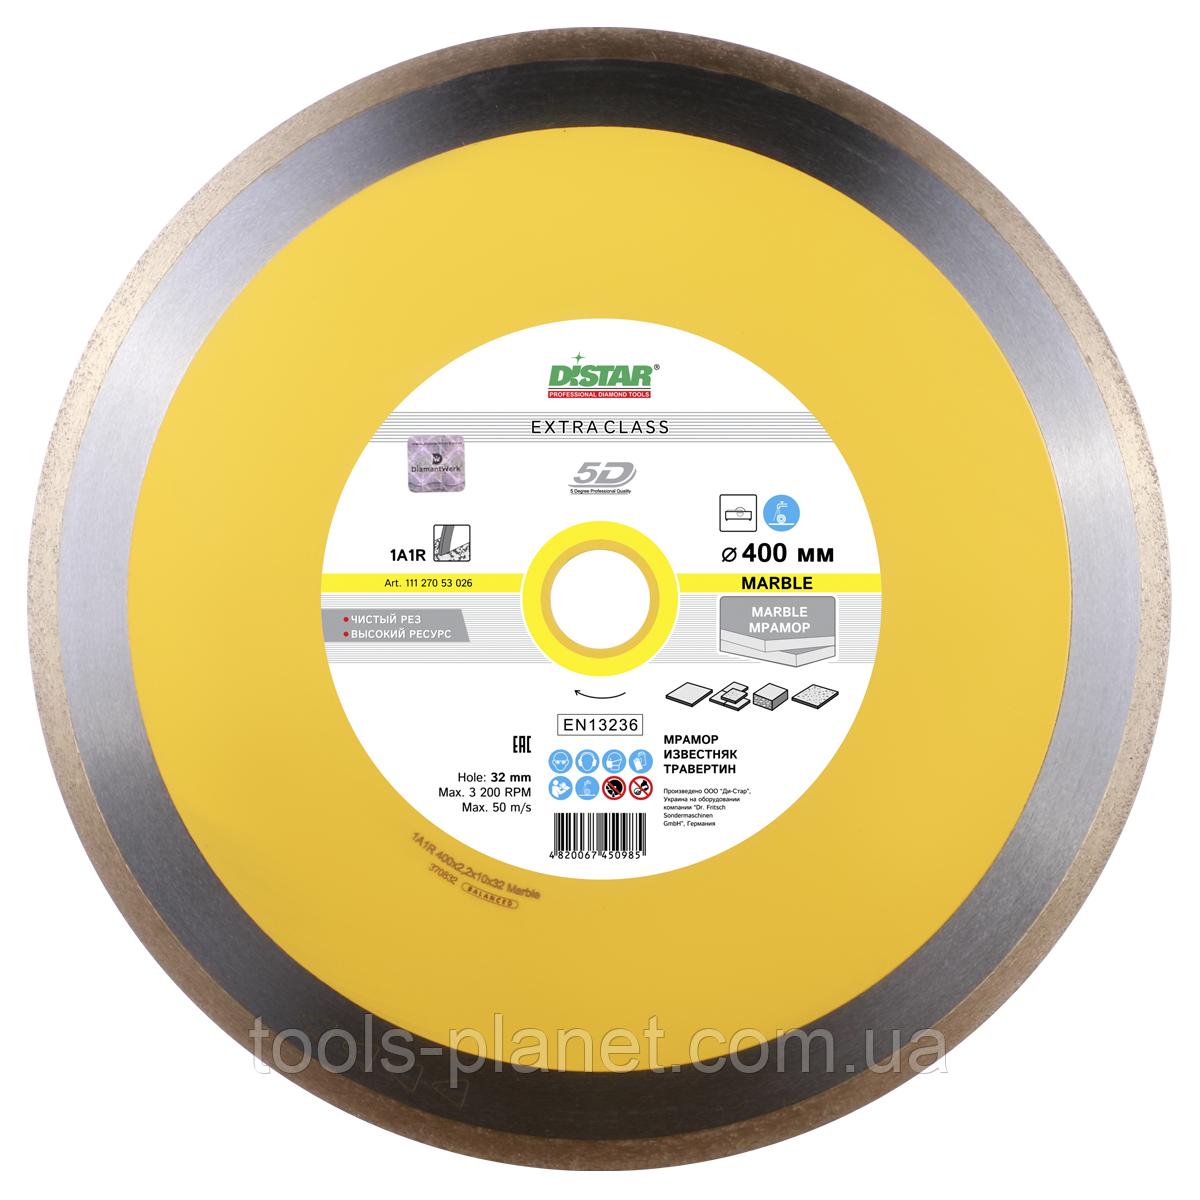 Алмазный диск Distar 1A1R 400 x 2,2 x 10 x 32 Marble 5D (11127053026)